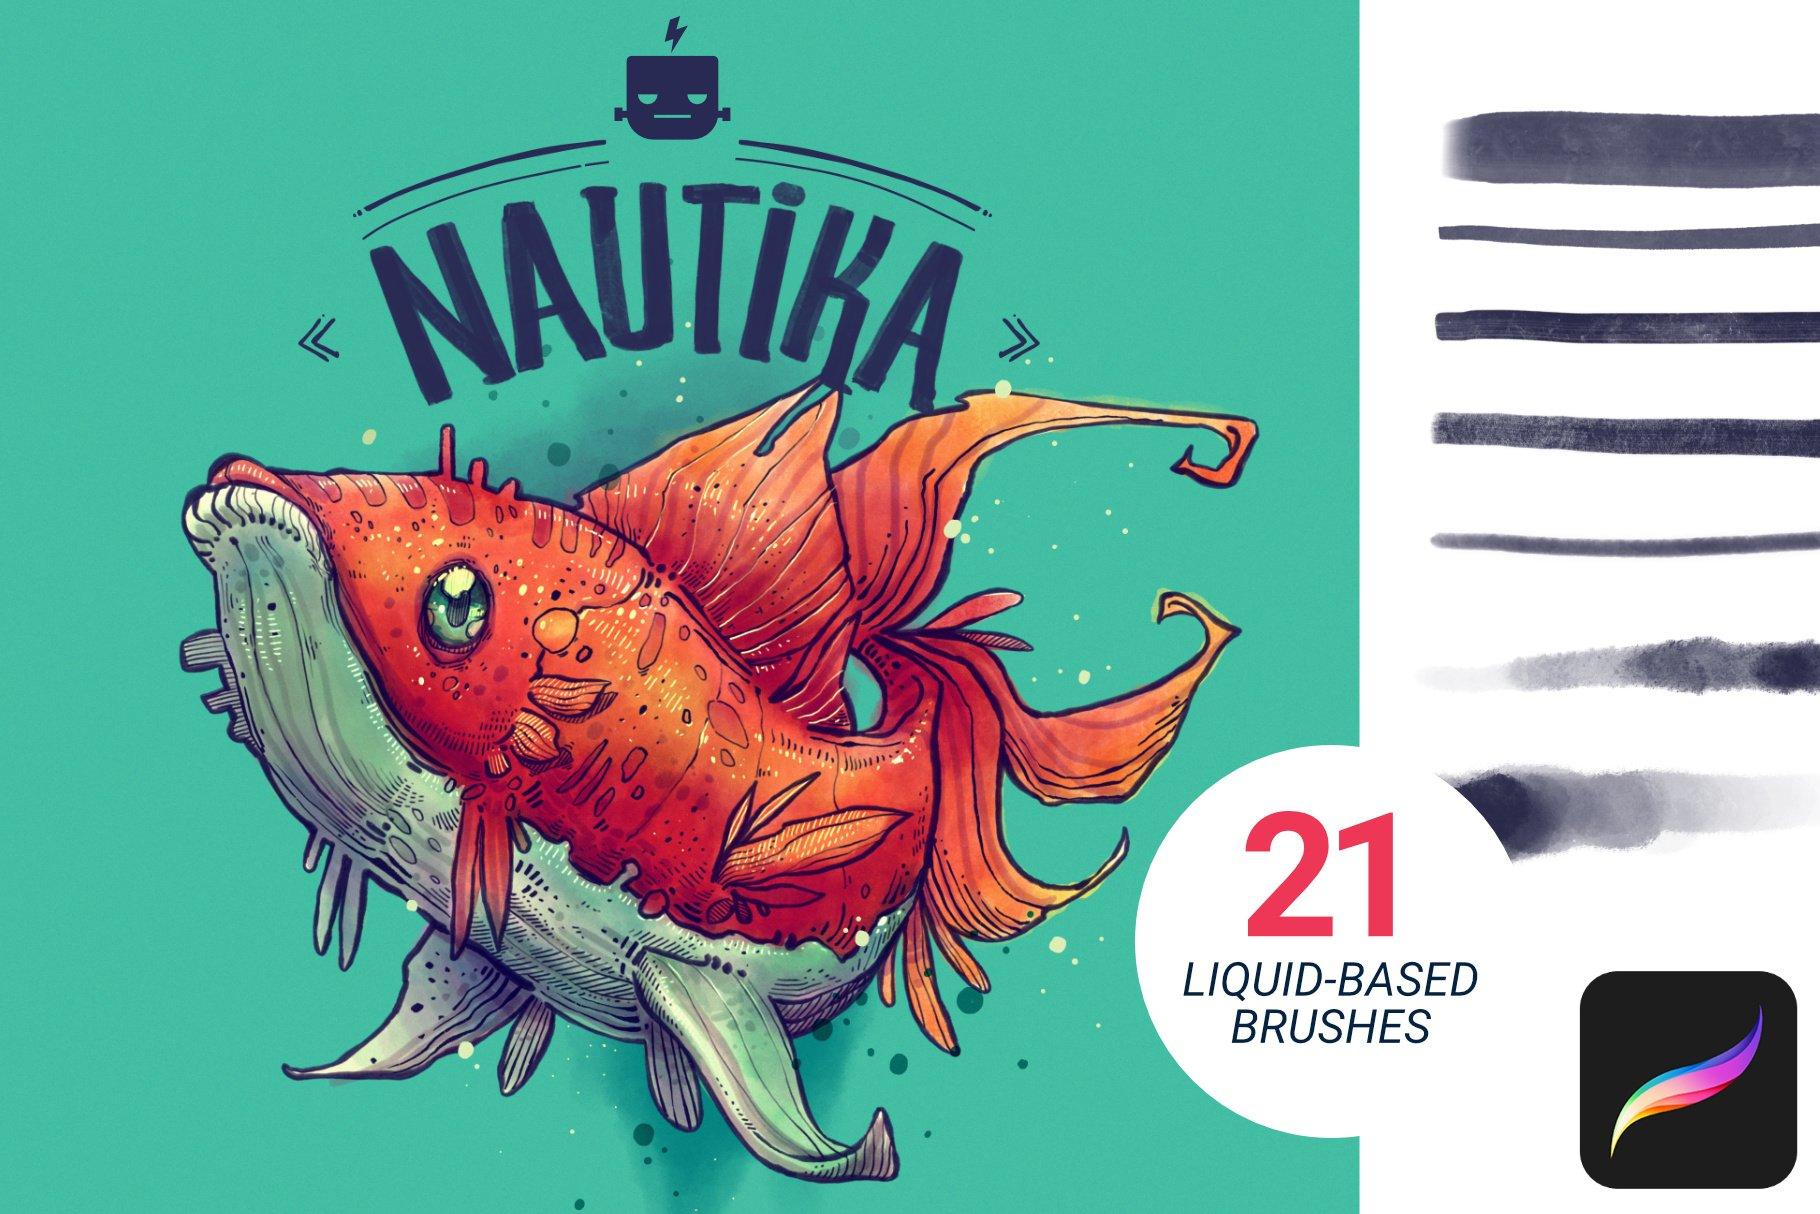 艺术绘画手绘水彩水墨Procreate笔刷 Nautika – Brush Pack for Procreate插图